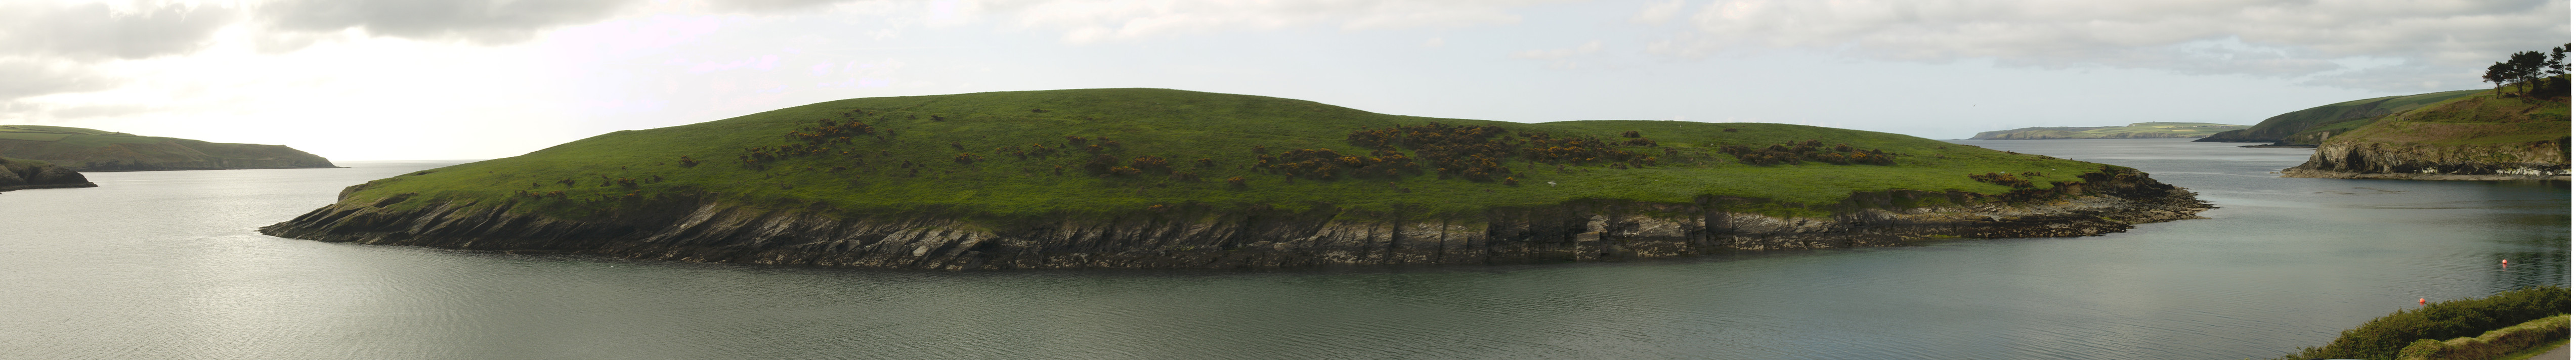 Sandycove Island Swim